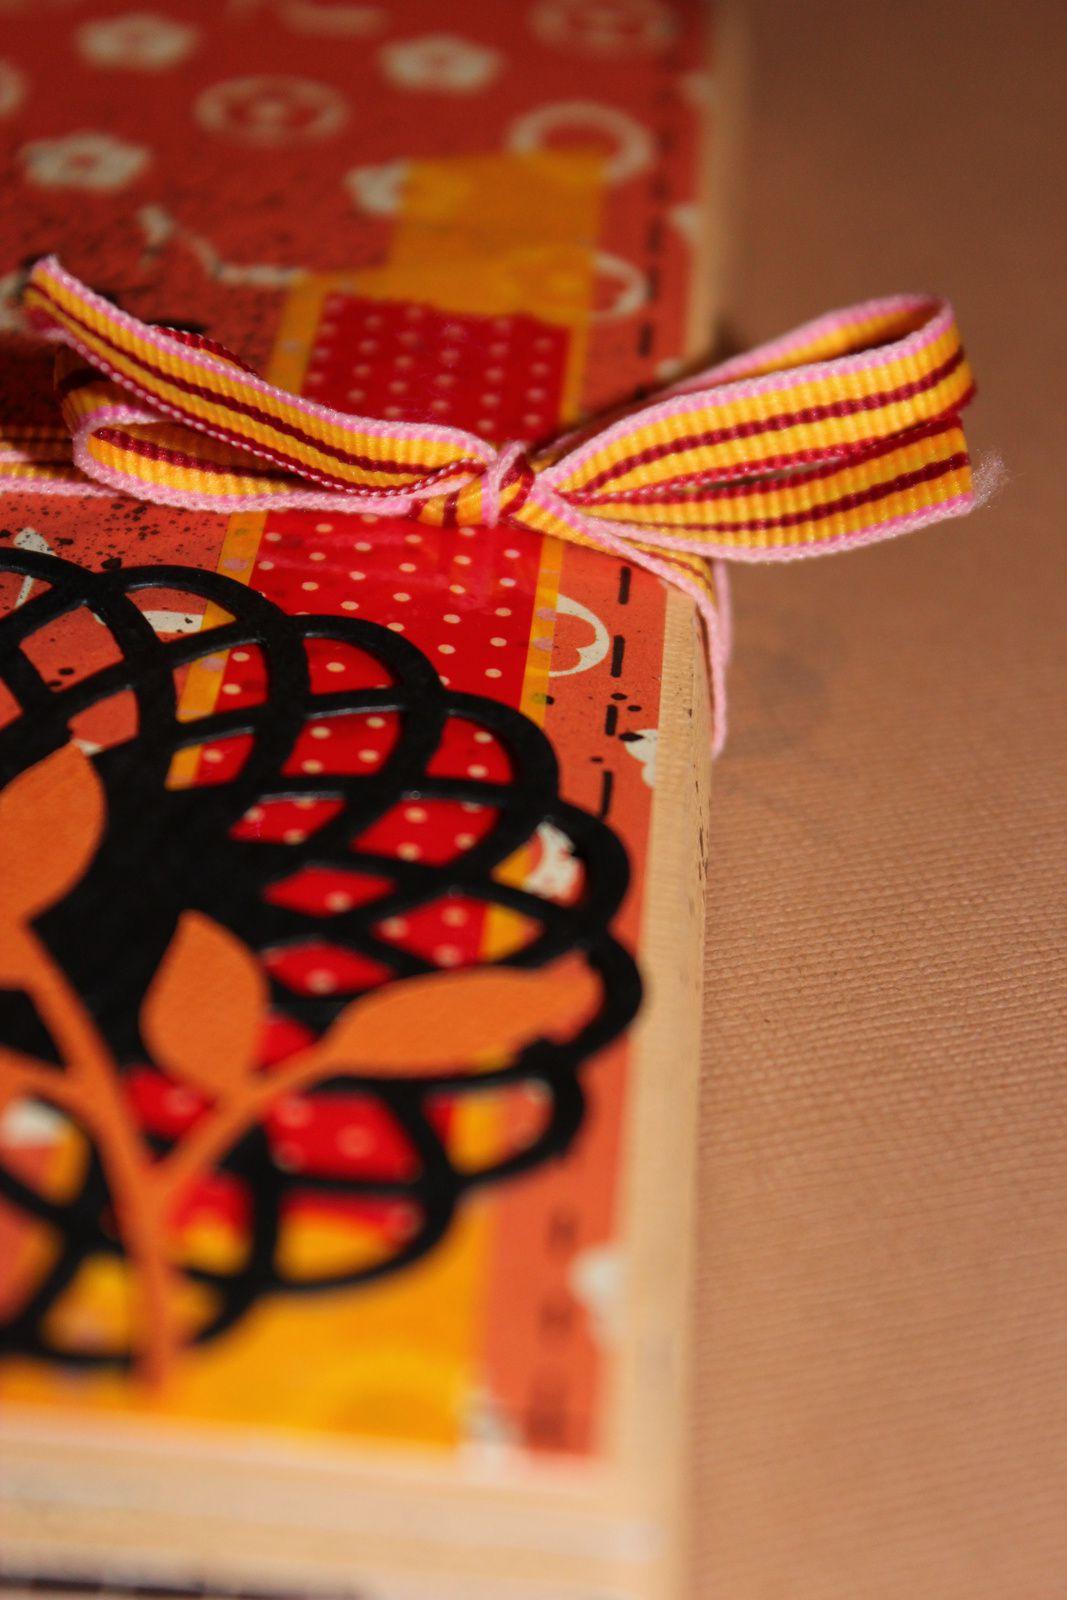 http://luniversdegarfield59.over-blog.com luniversdegarfield59 garfield59 mini album scrap scrapbooking lily